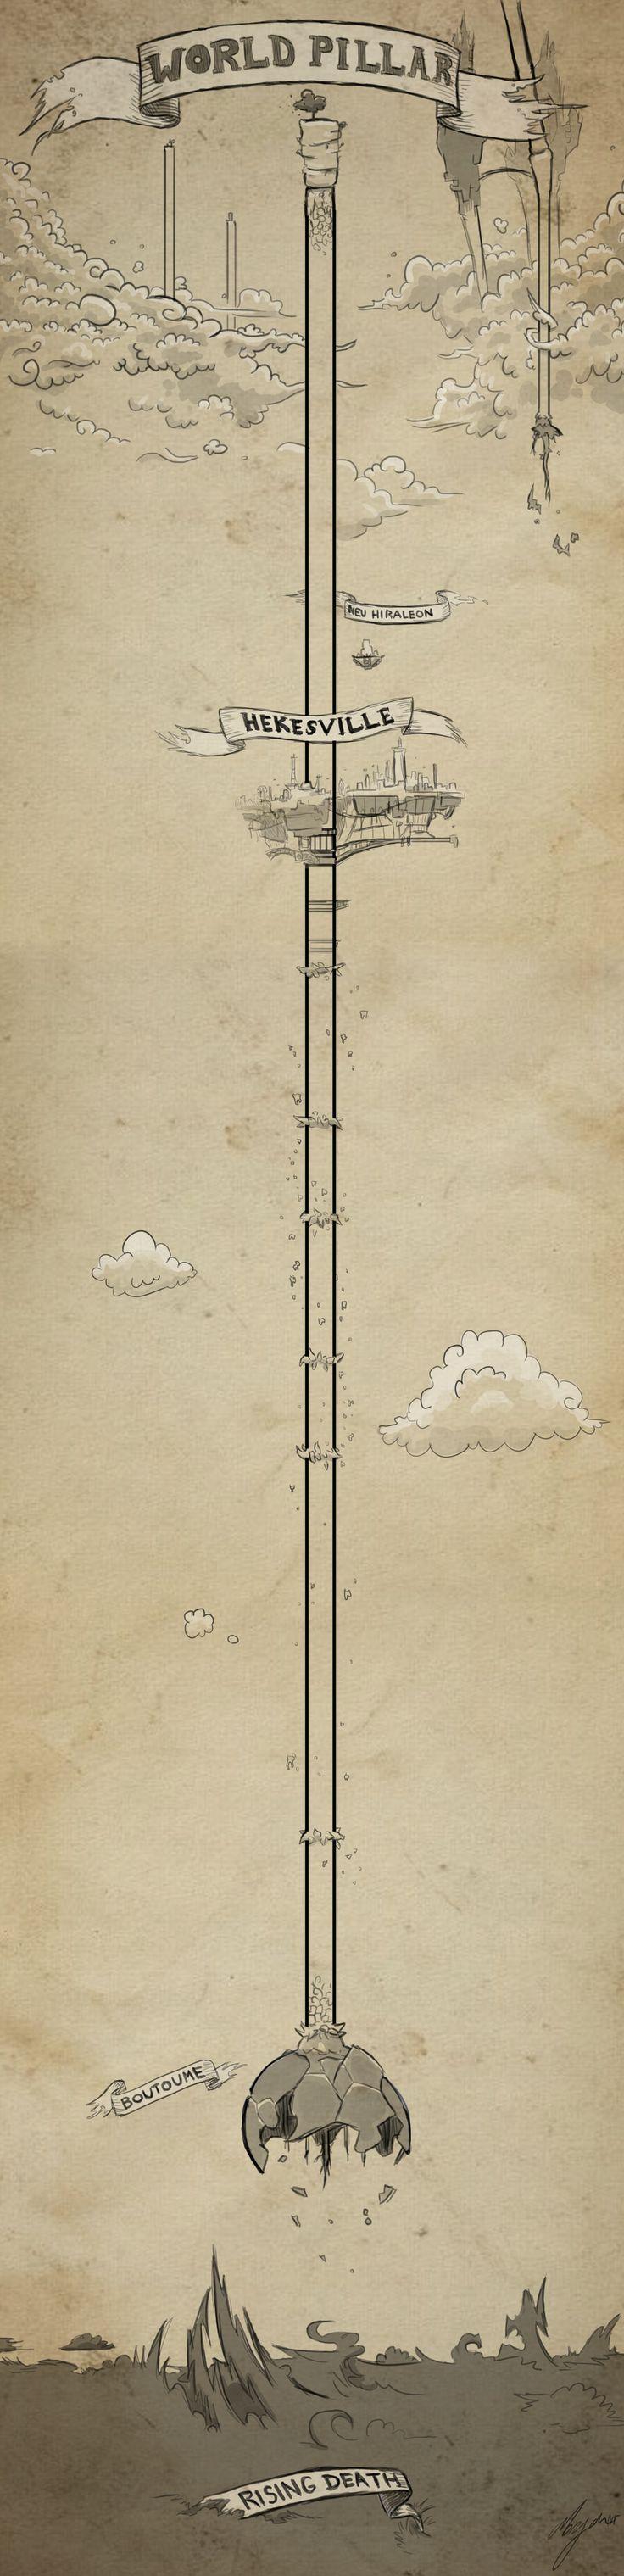 Gravity Rush World Pillar Map by Morganicism